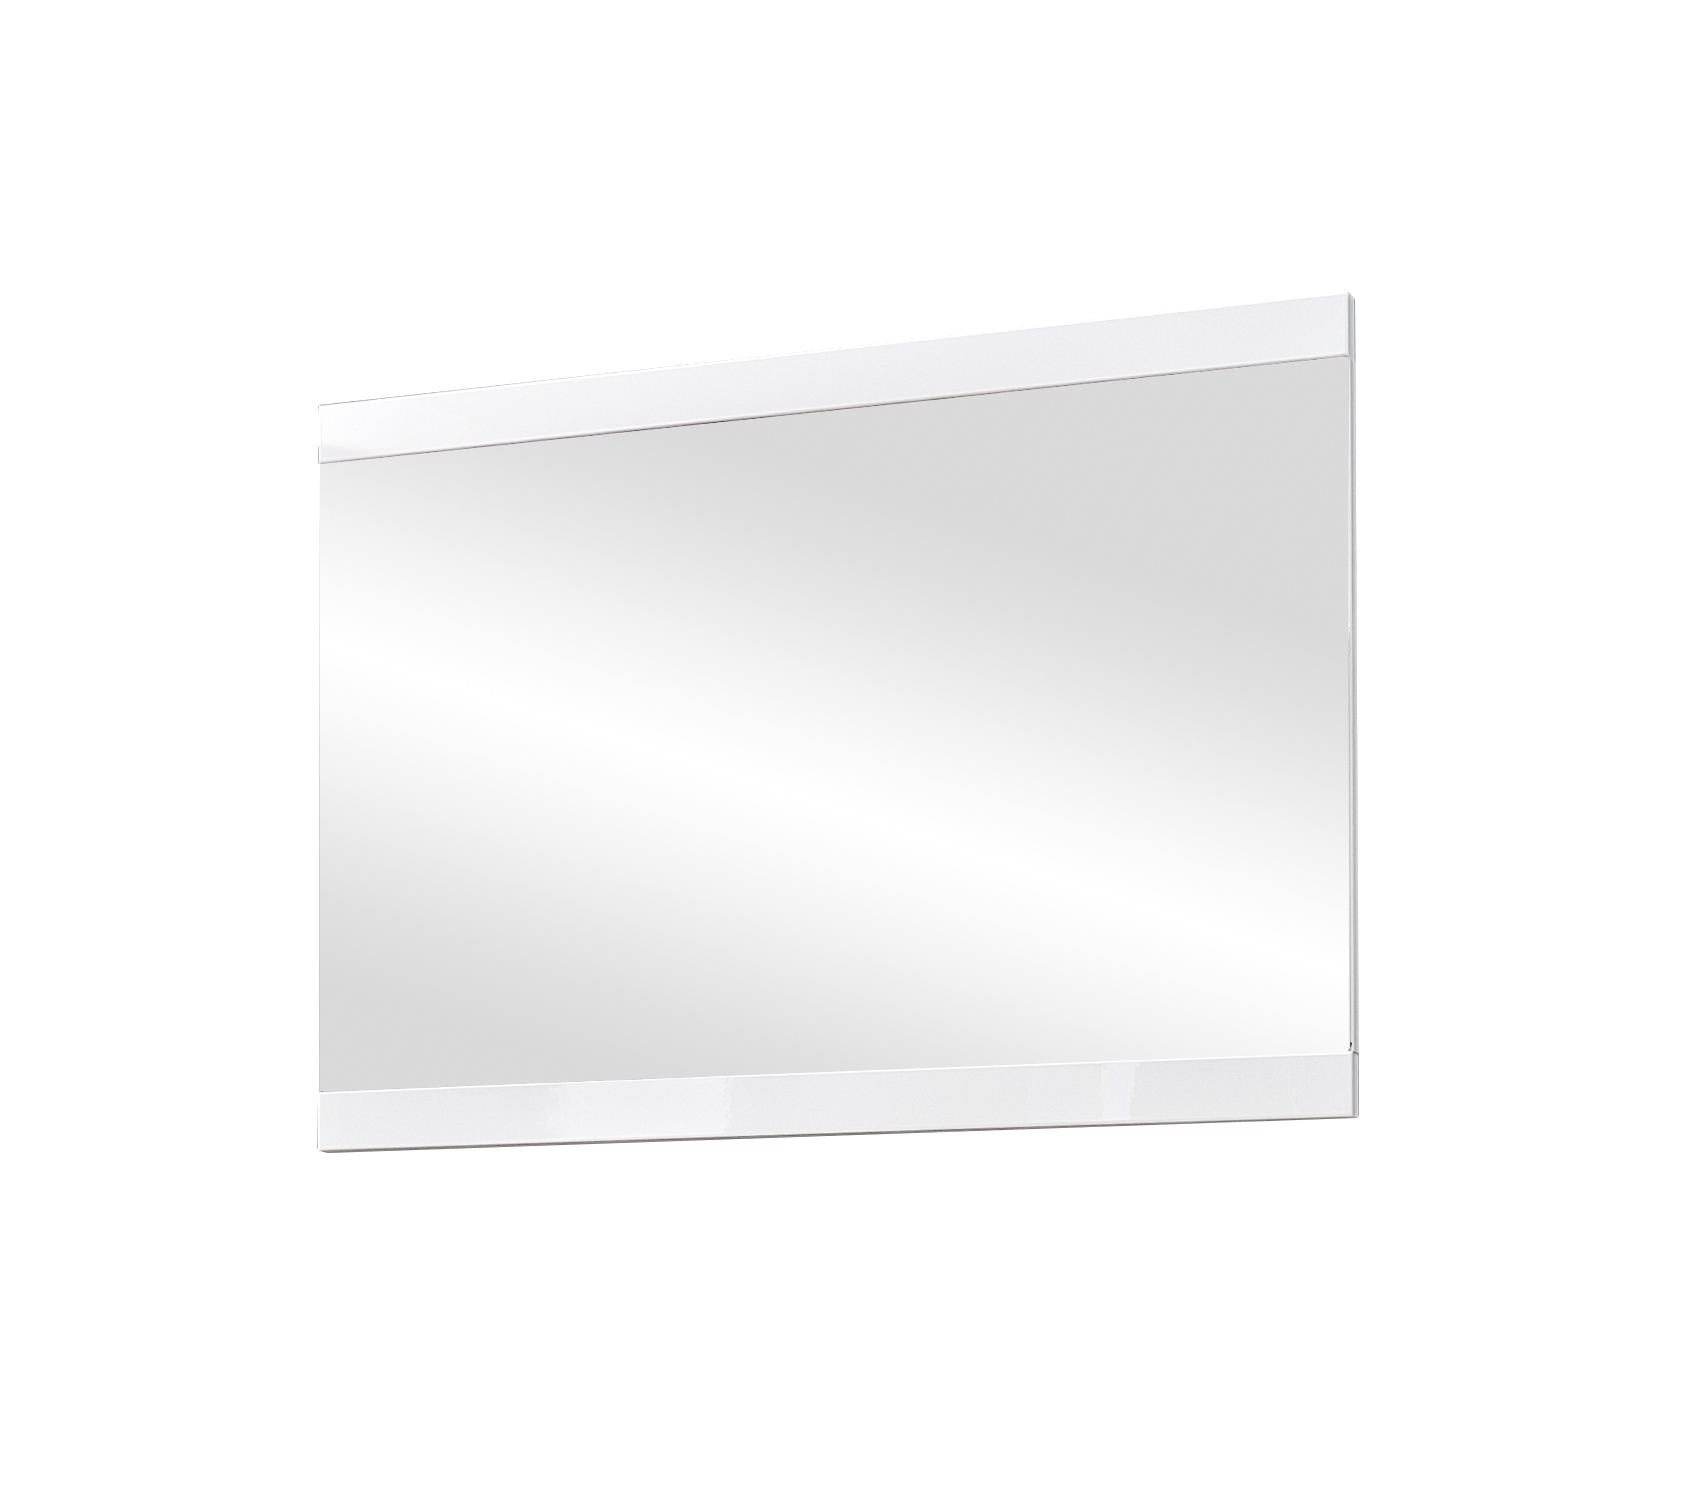 Oglinda din MDF, Life Alb, 92 x 66 cm imagine